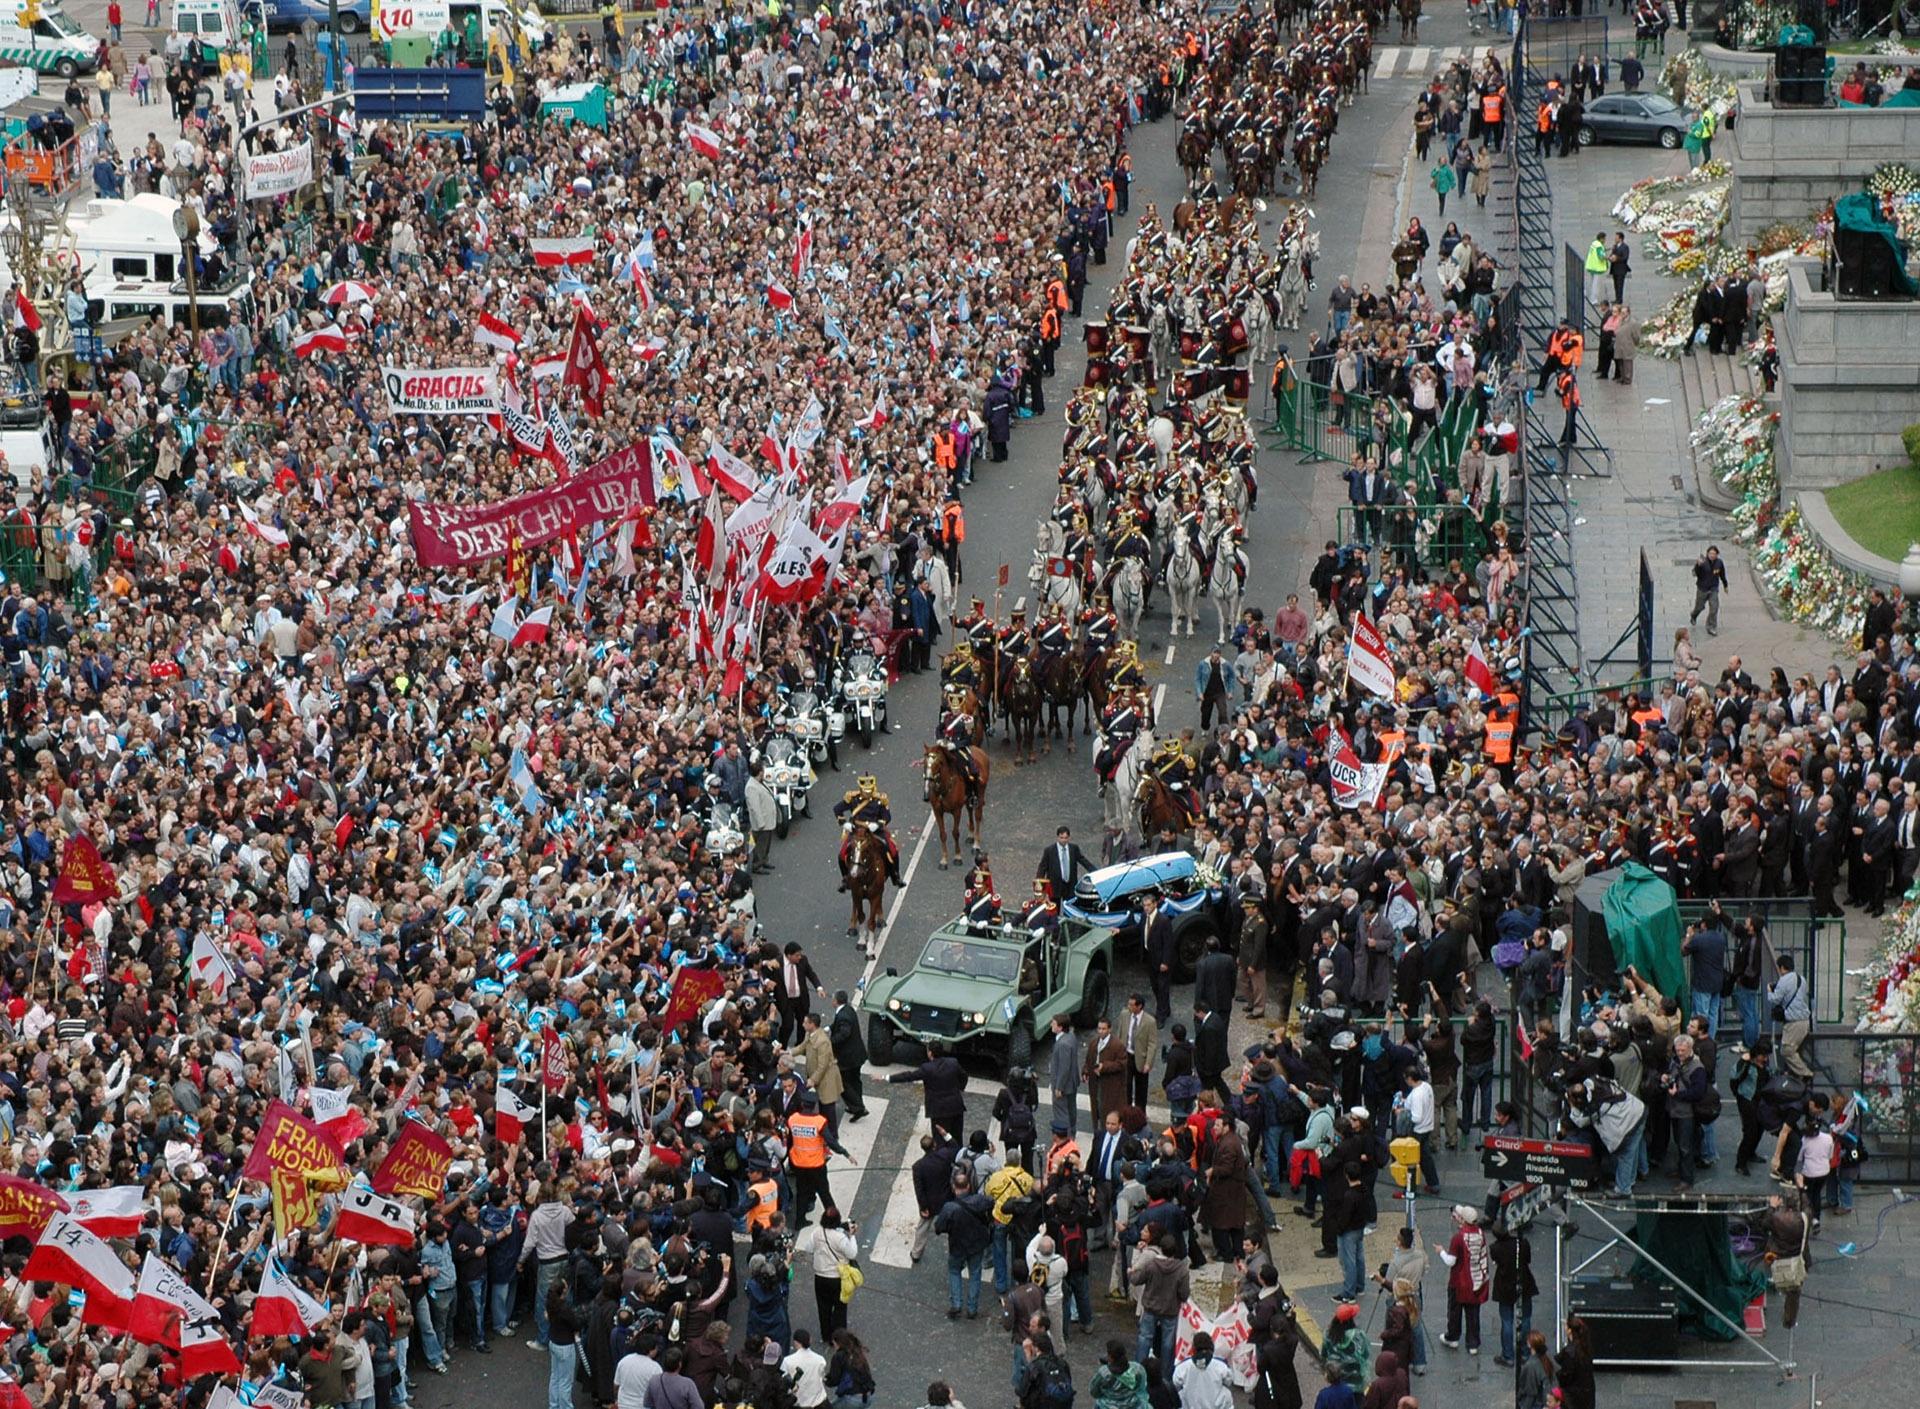 Una multitud acompañó el féretro en el último adiós a Raúl Alfonsín, en 2009